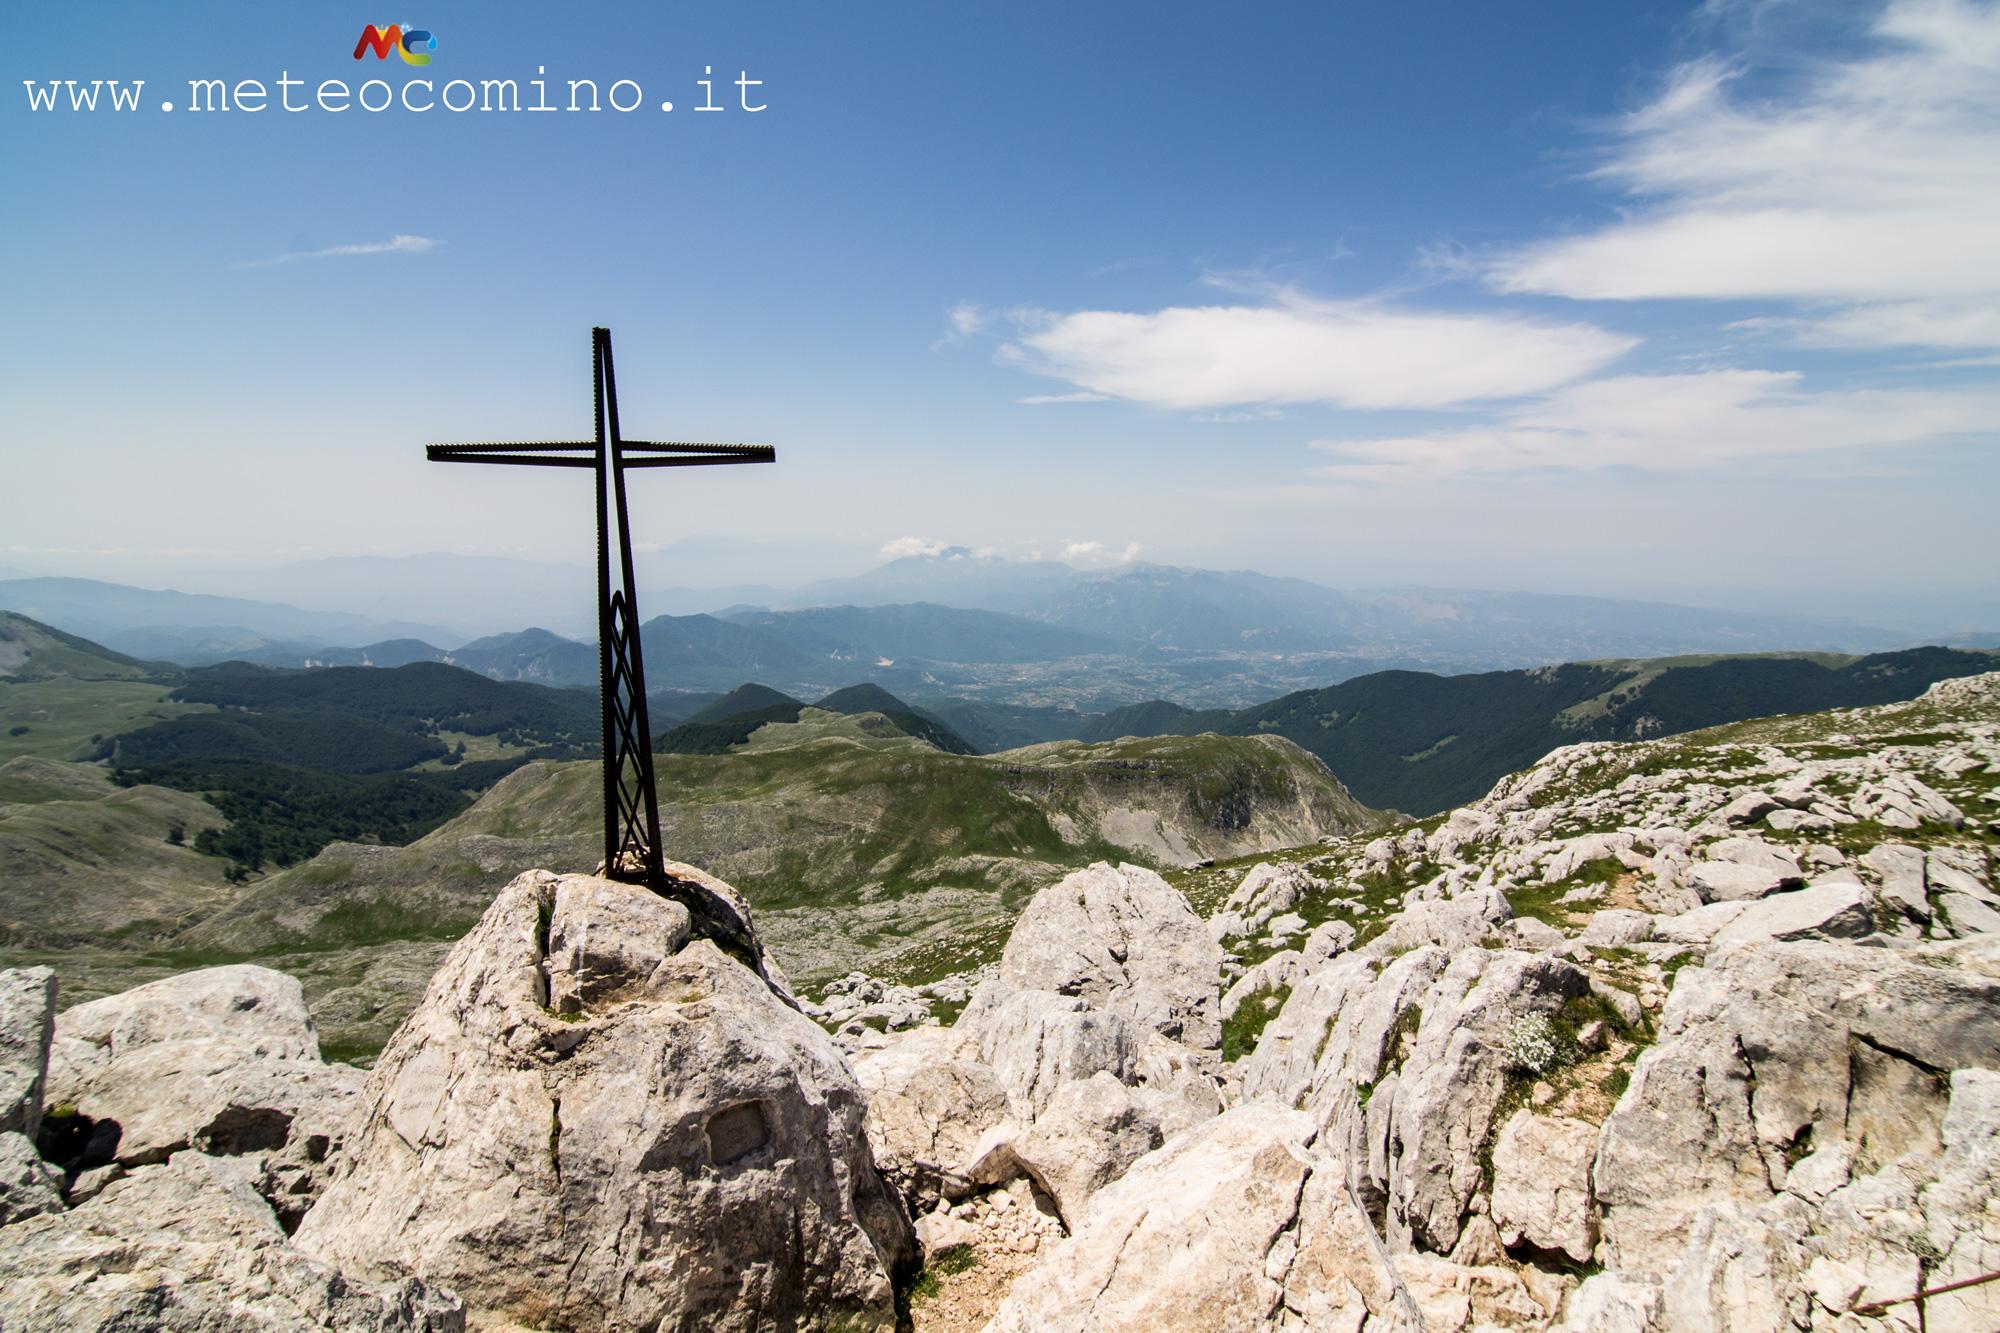 Valle_di_comino_dal_monte_meta_2.jpg